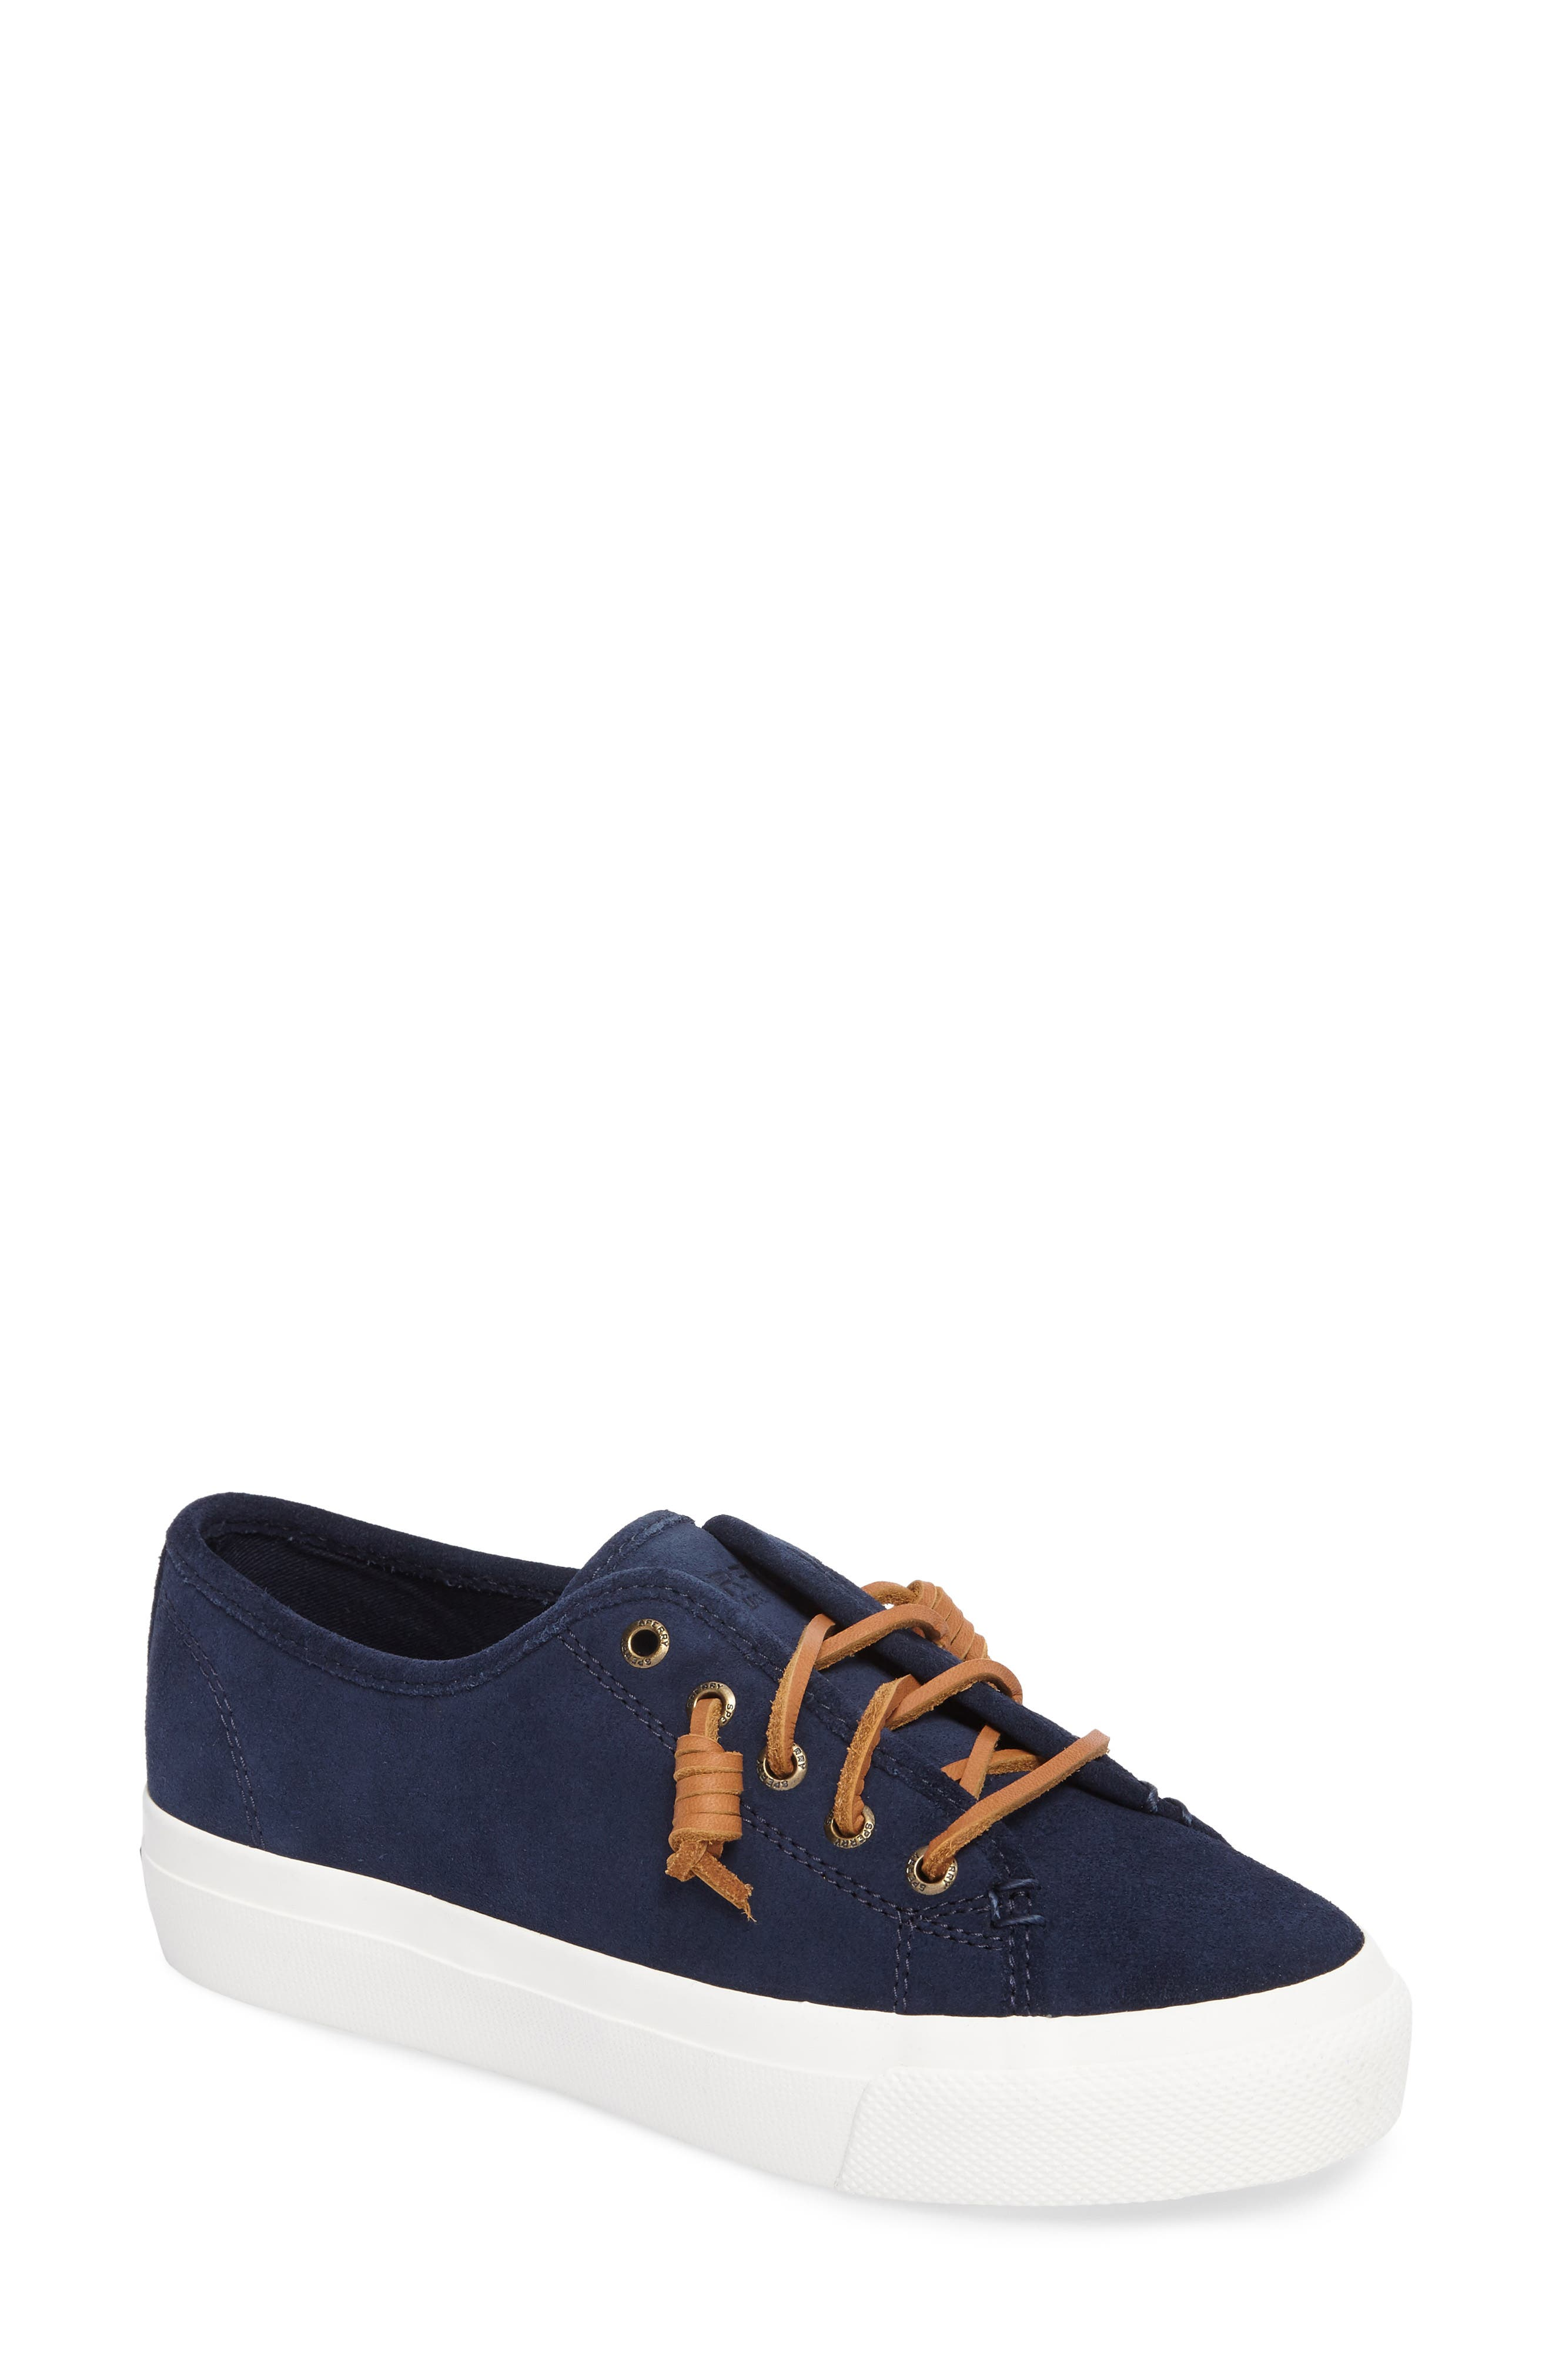 Sky Sail Platform Sneaker,                         Main,                         color, Navy Suede